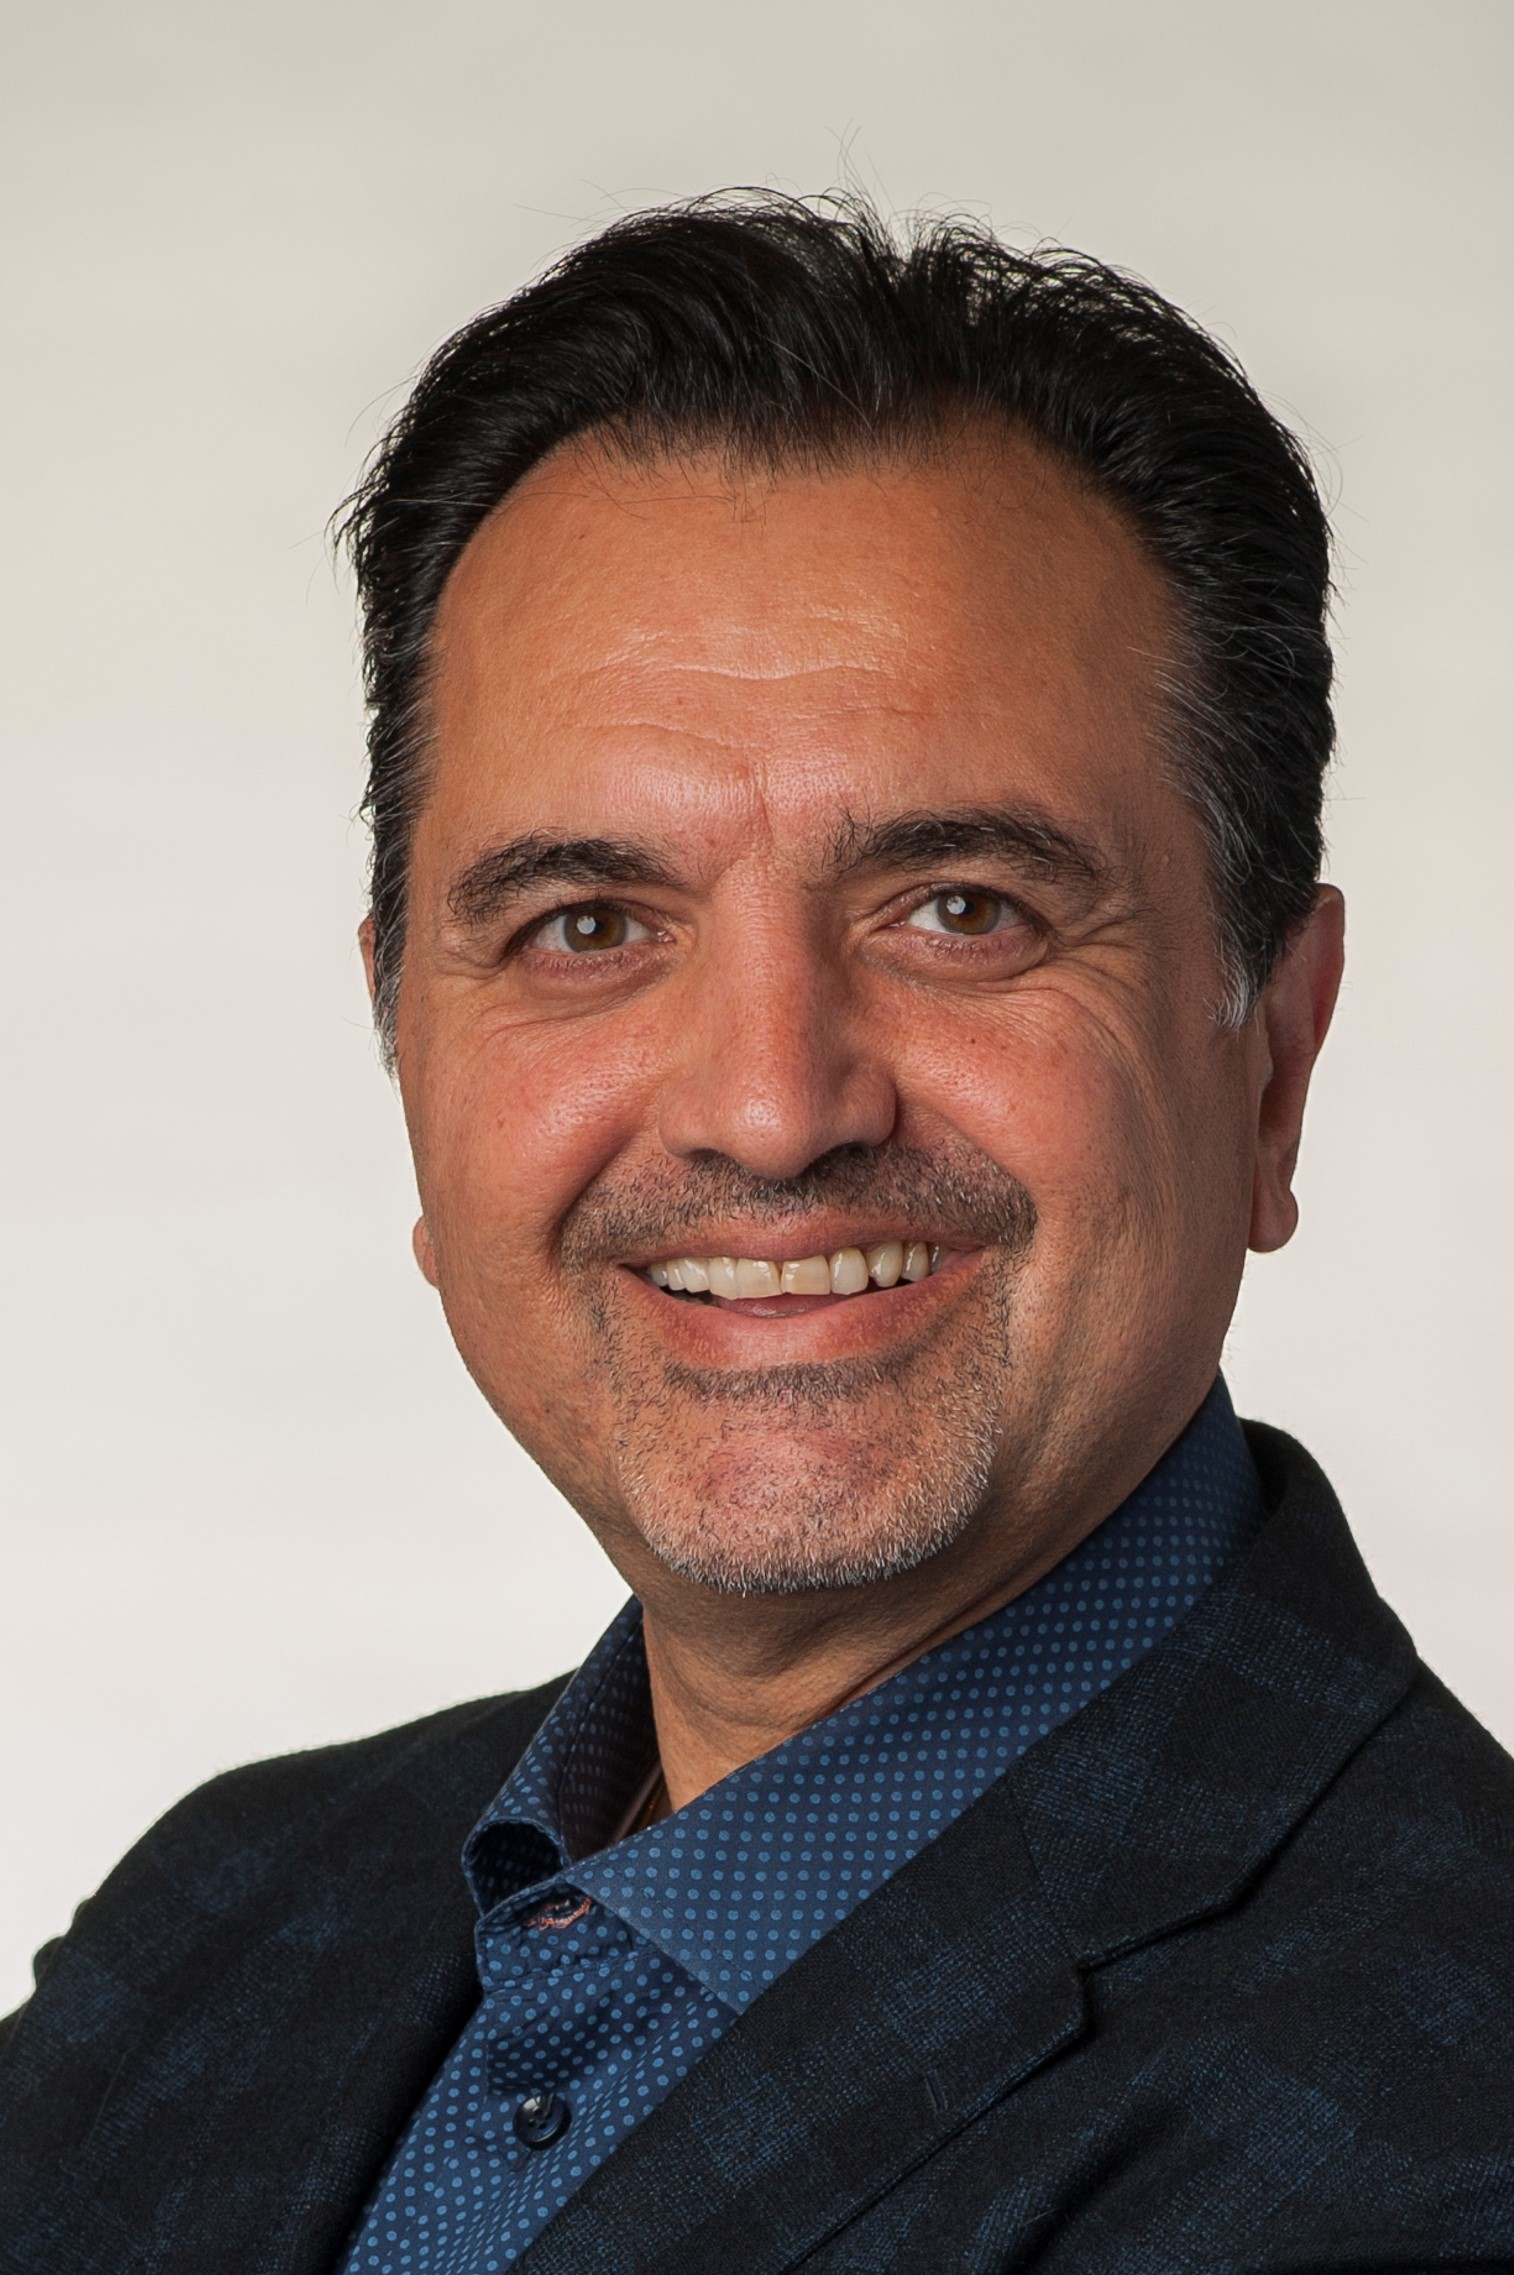 headshot of Navid Haghighi